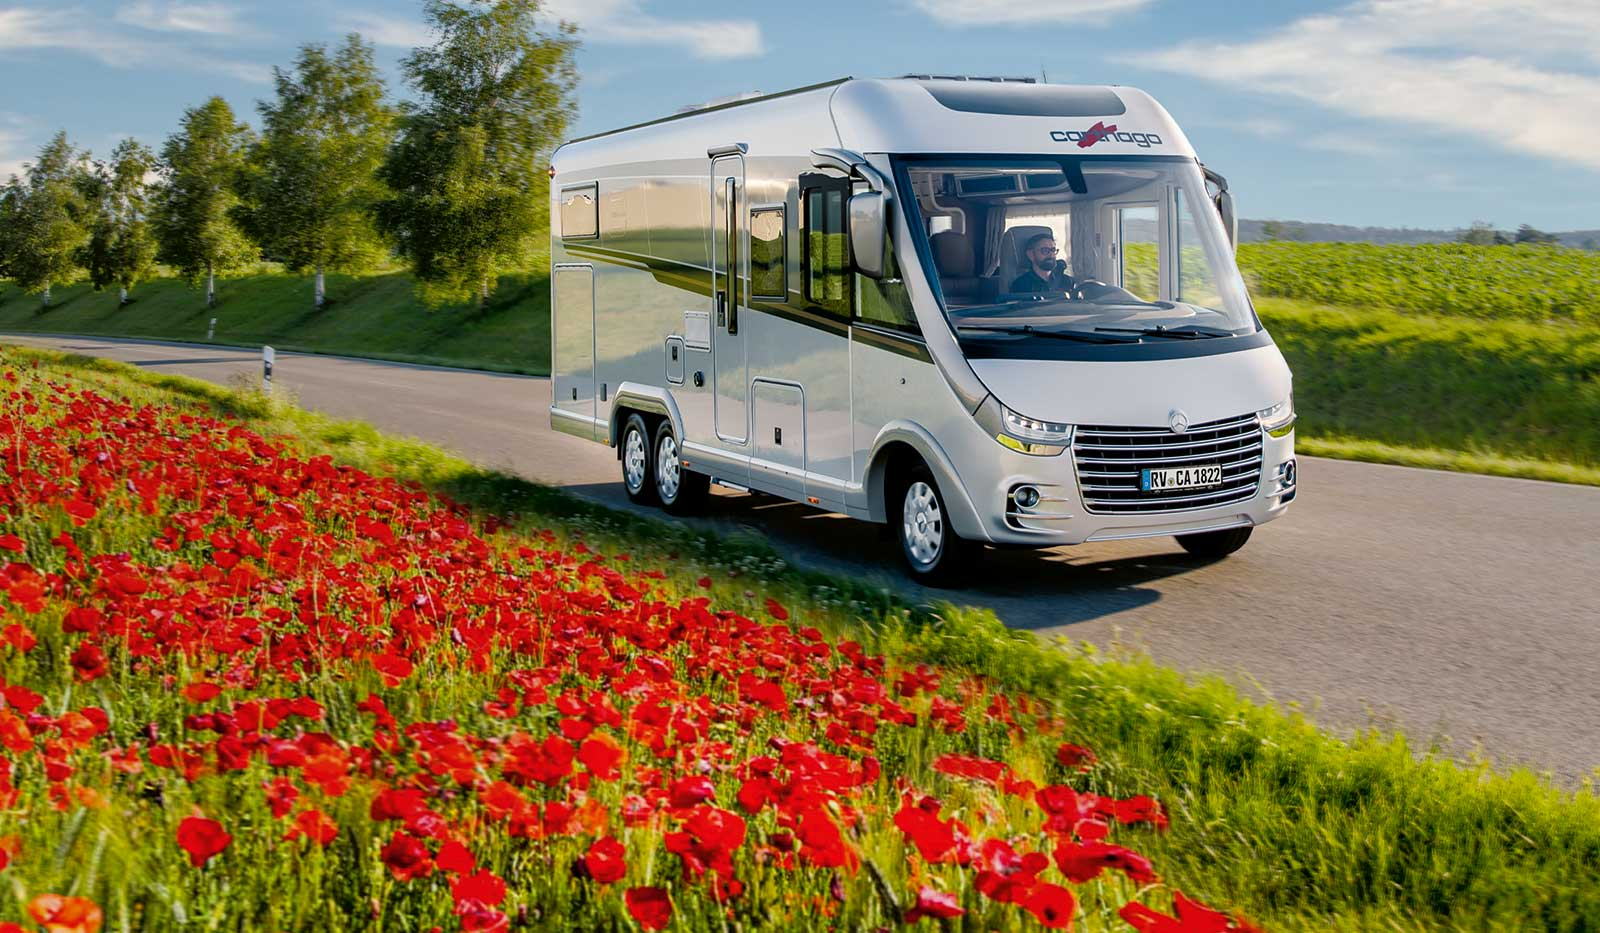 carthago reisemobile - Carthago Reisemobile – Wir sind dann mal weg!